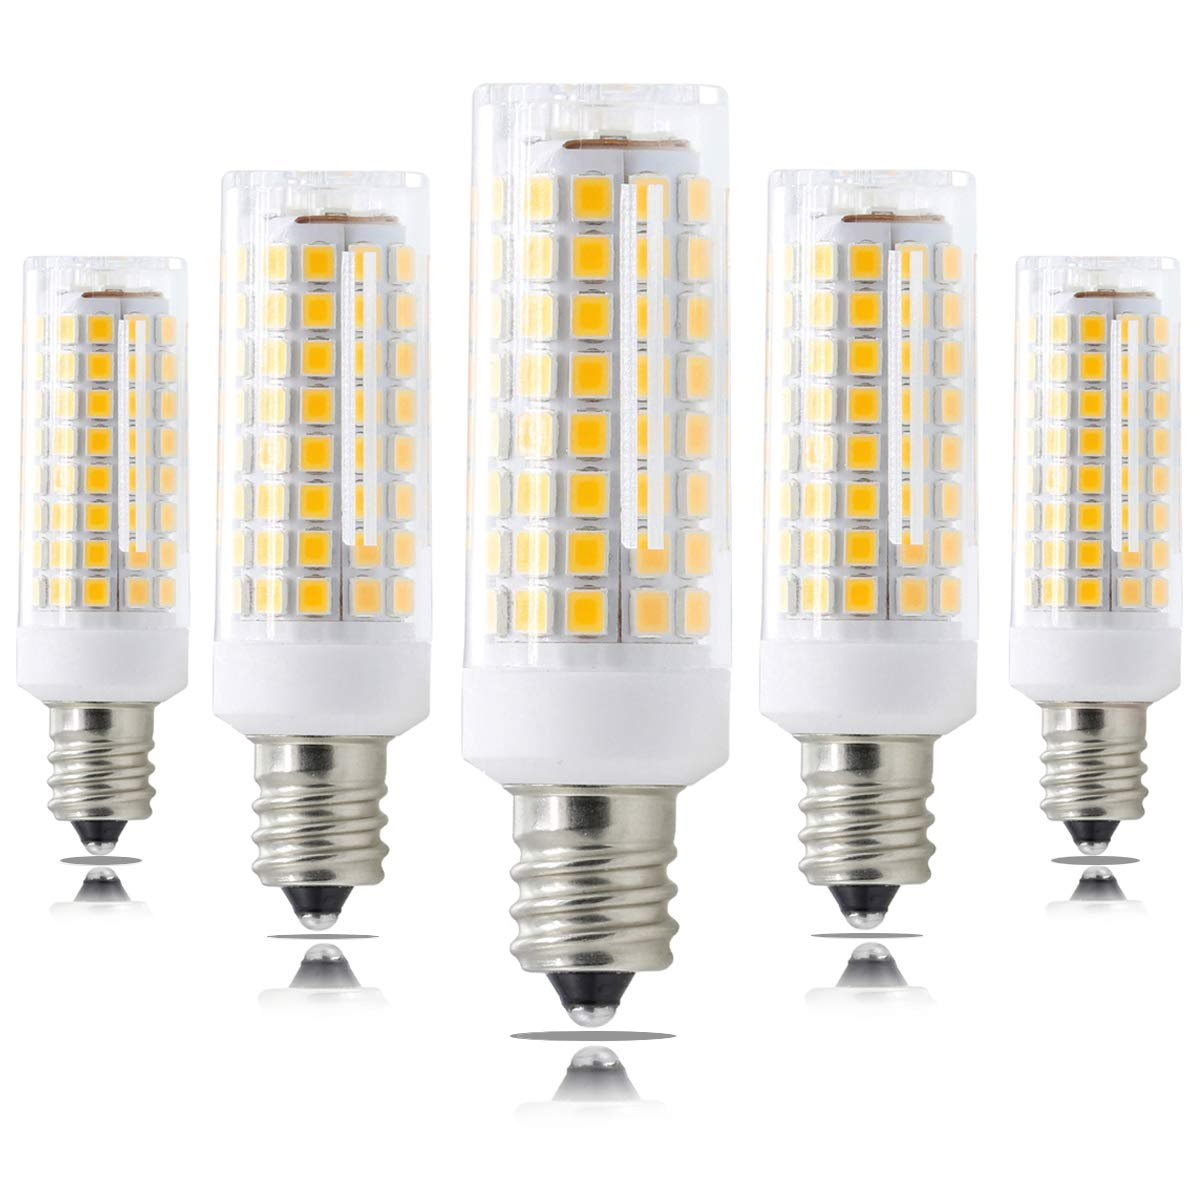 XRZT Dimmable E12 LED Bulb Candelabra Bulb, 7W(75W Halogen Bulbs Equivalent), T3/T4 Warm White 3000K Ceiling Fan Bulbs(5-Pack)